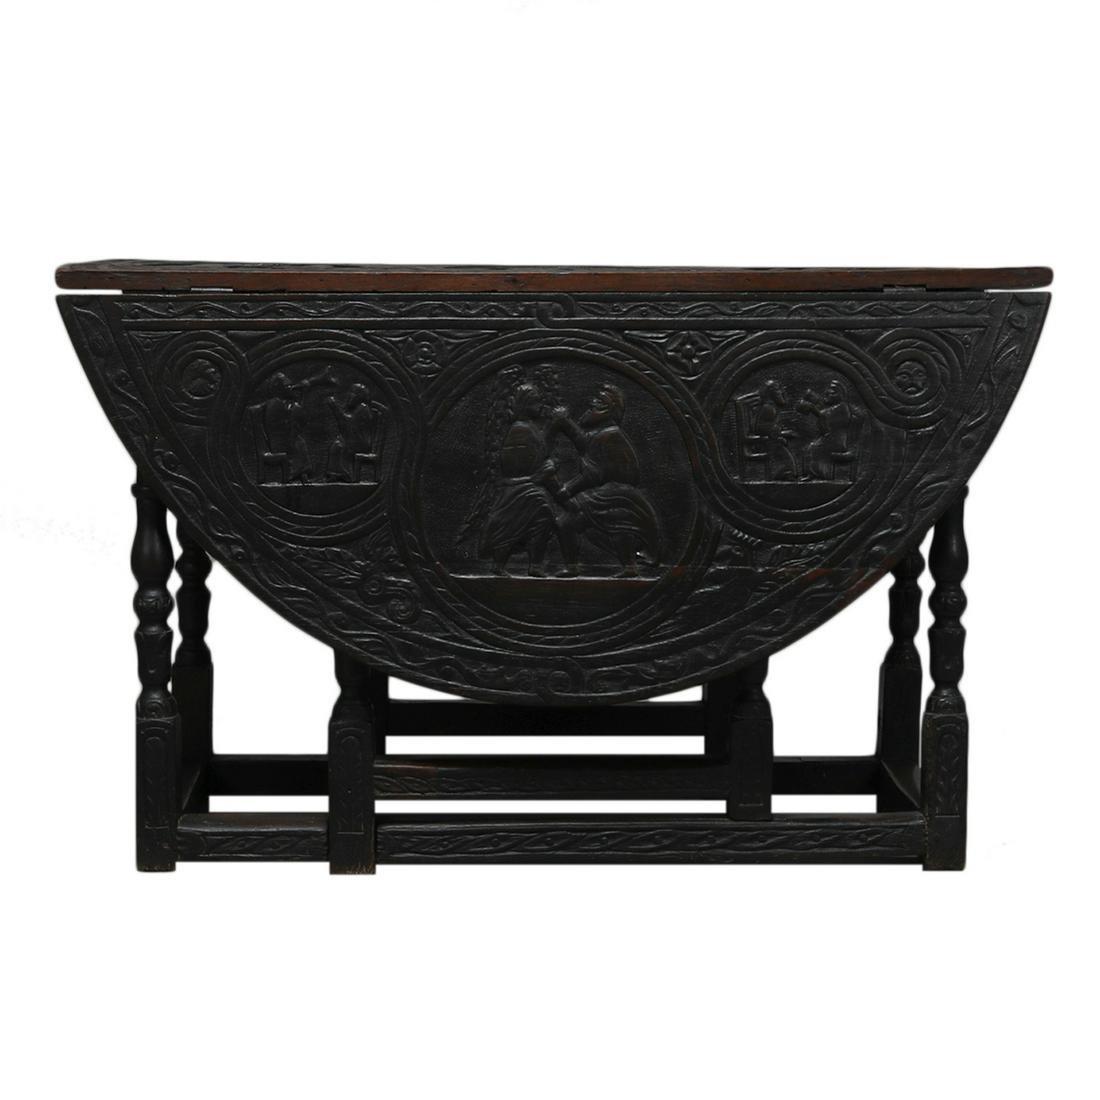 Carved English Jacobean Table, Glastonbury Abbey,17th C